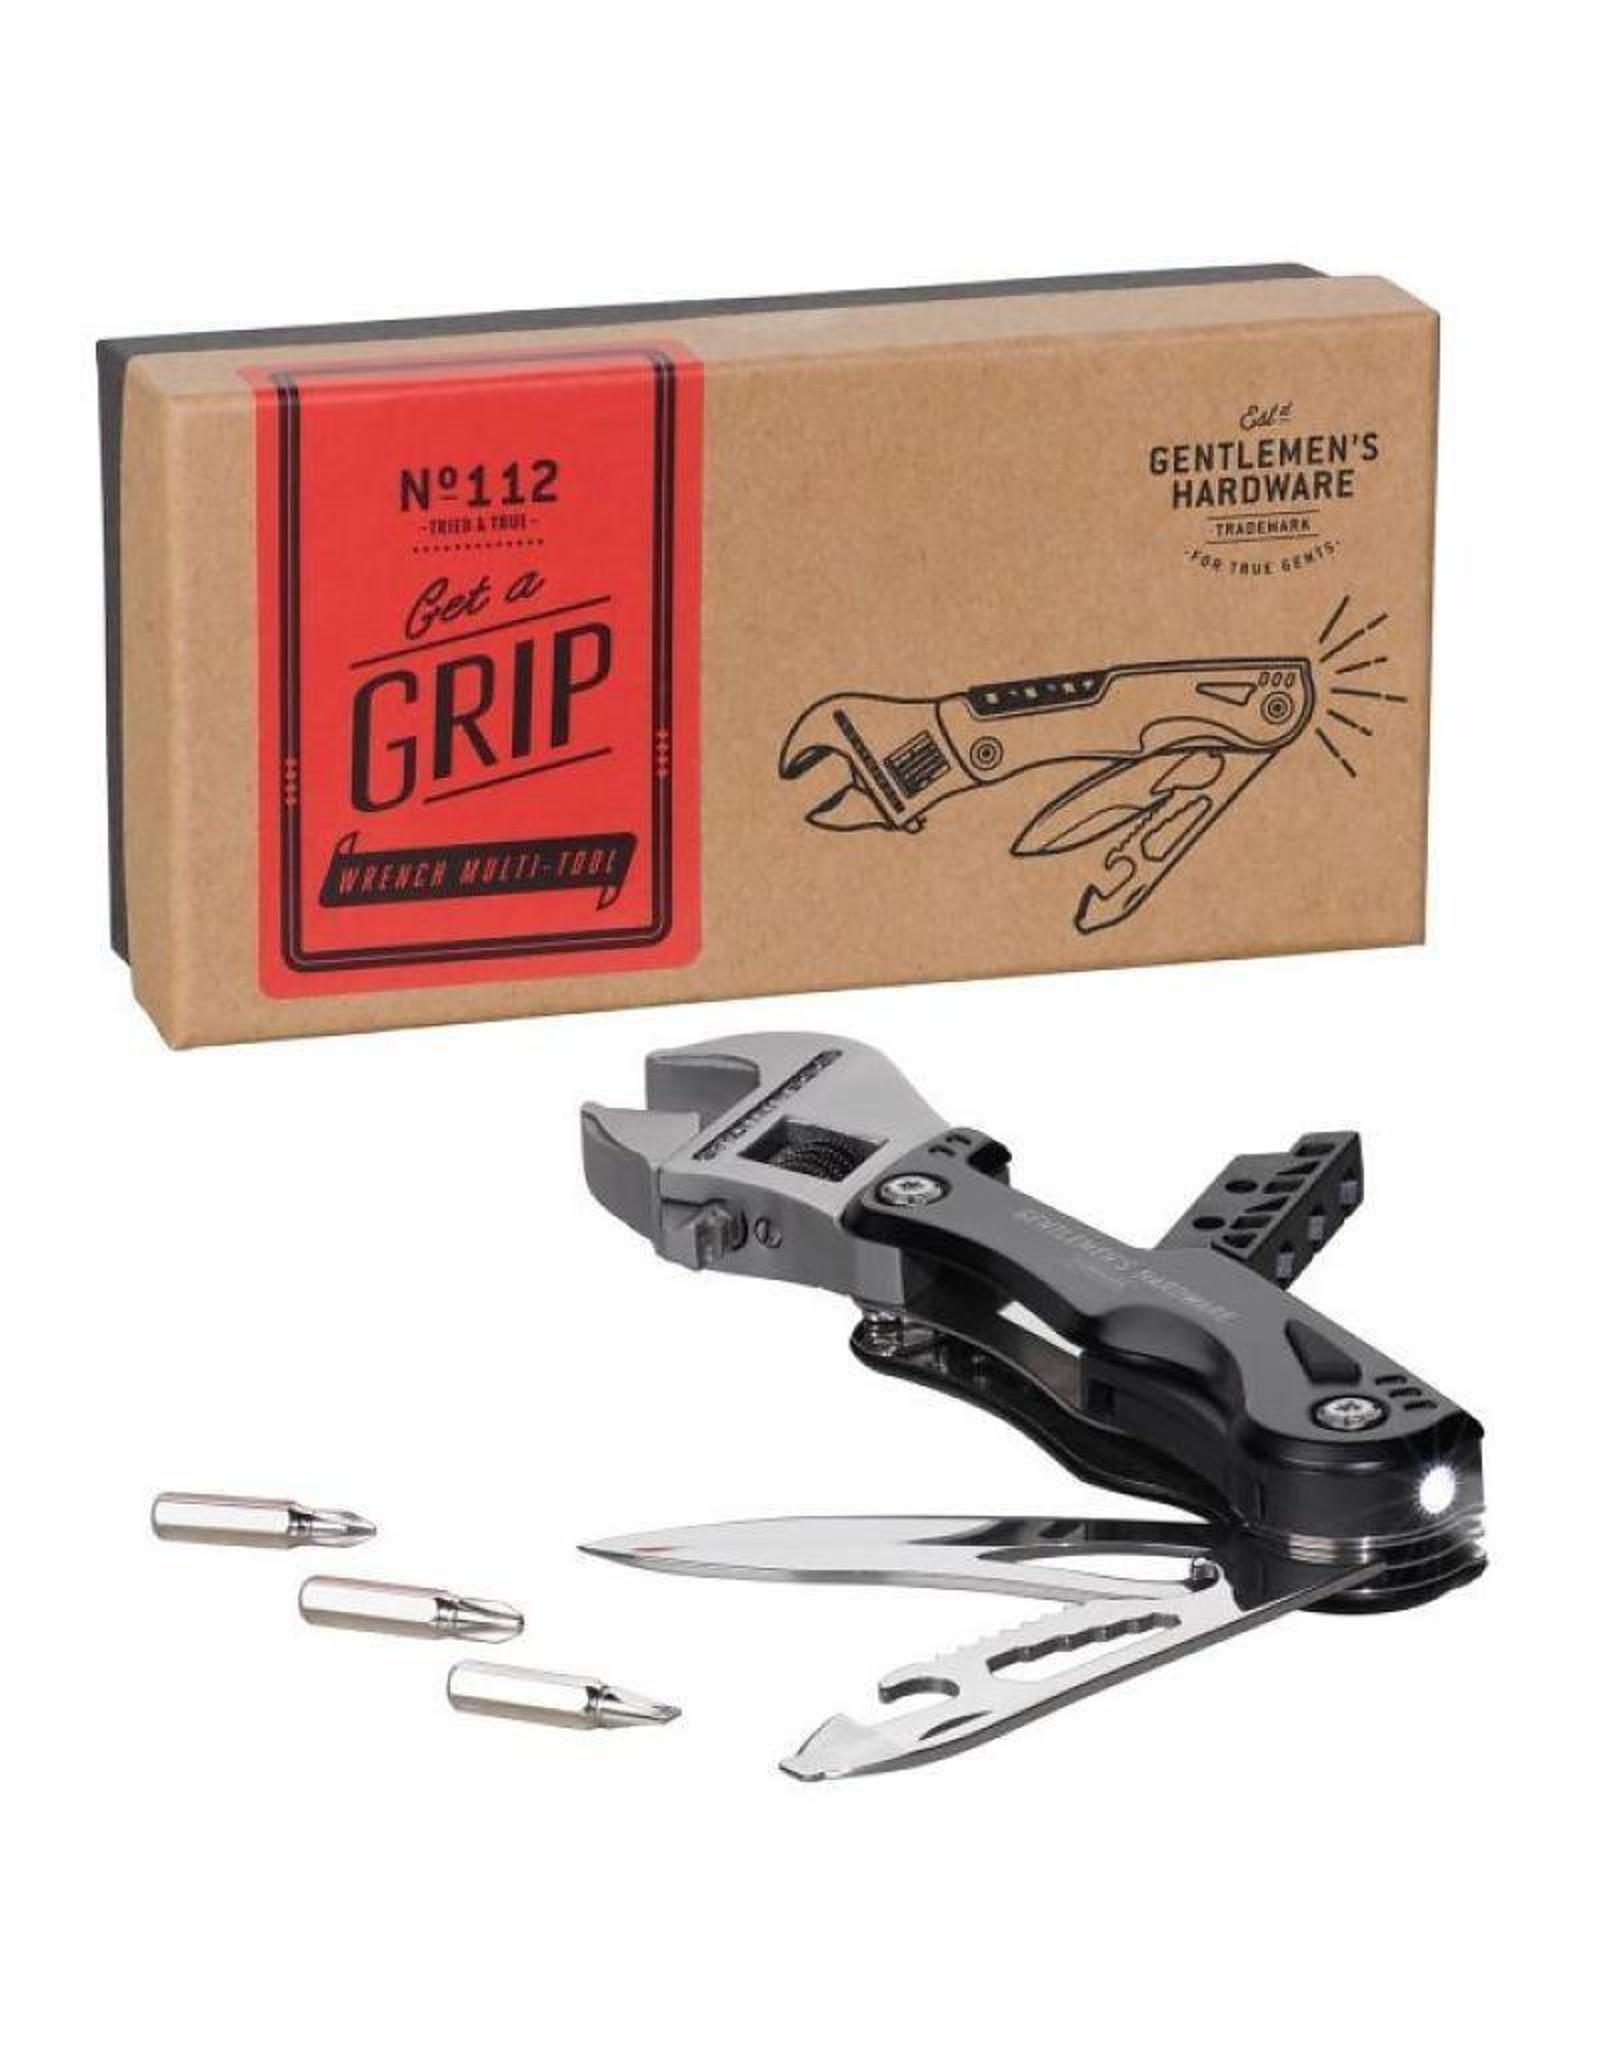 Gentleman's Hardware Wrench Multi Tool